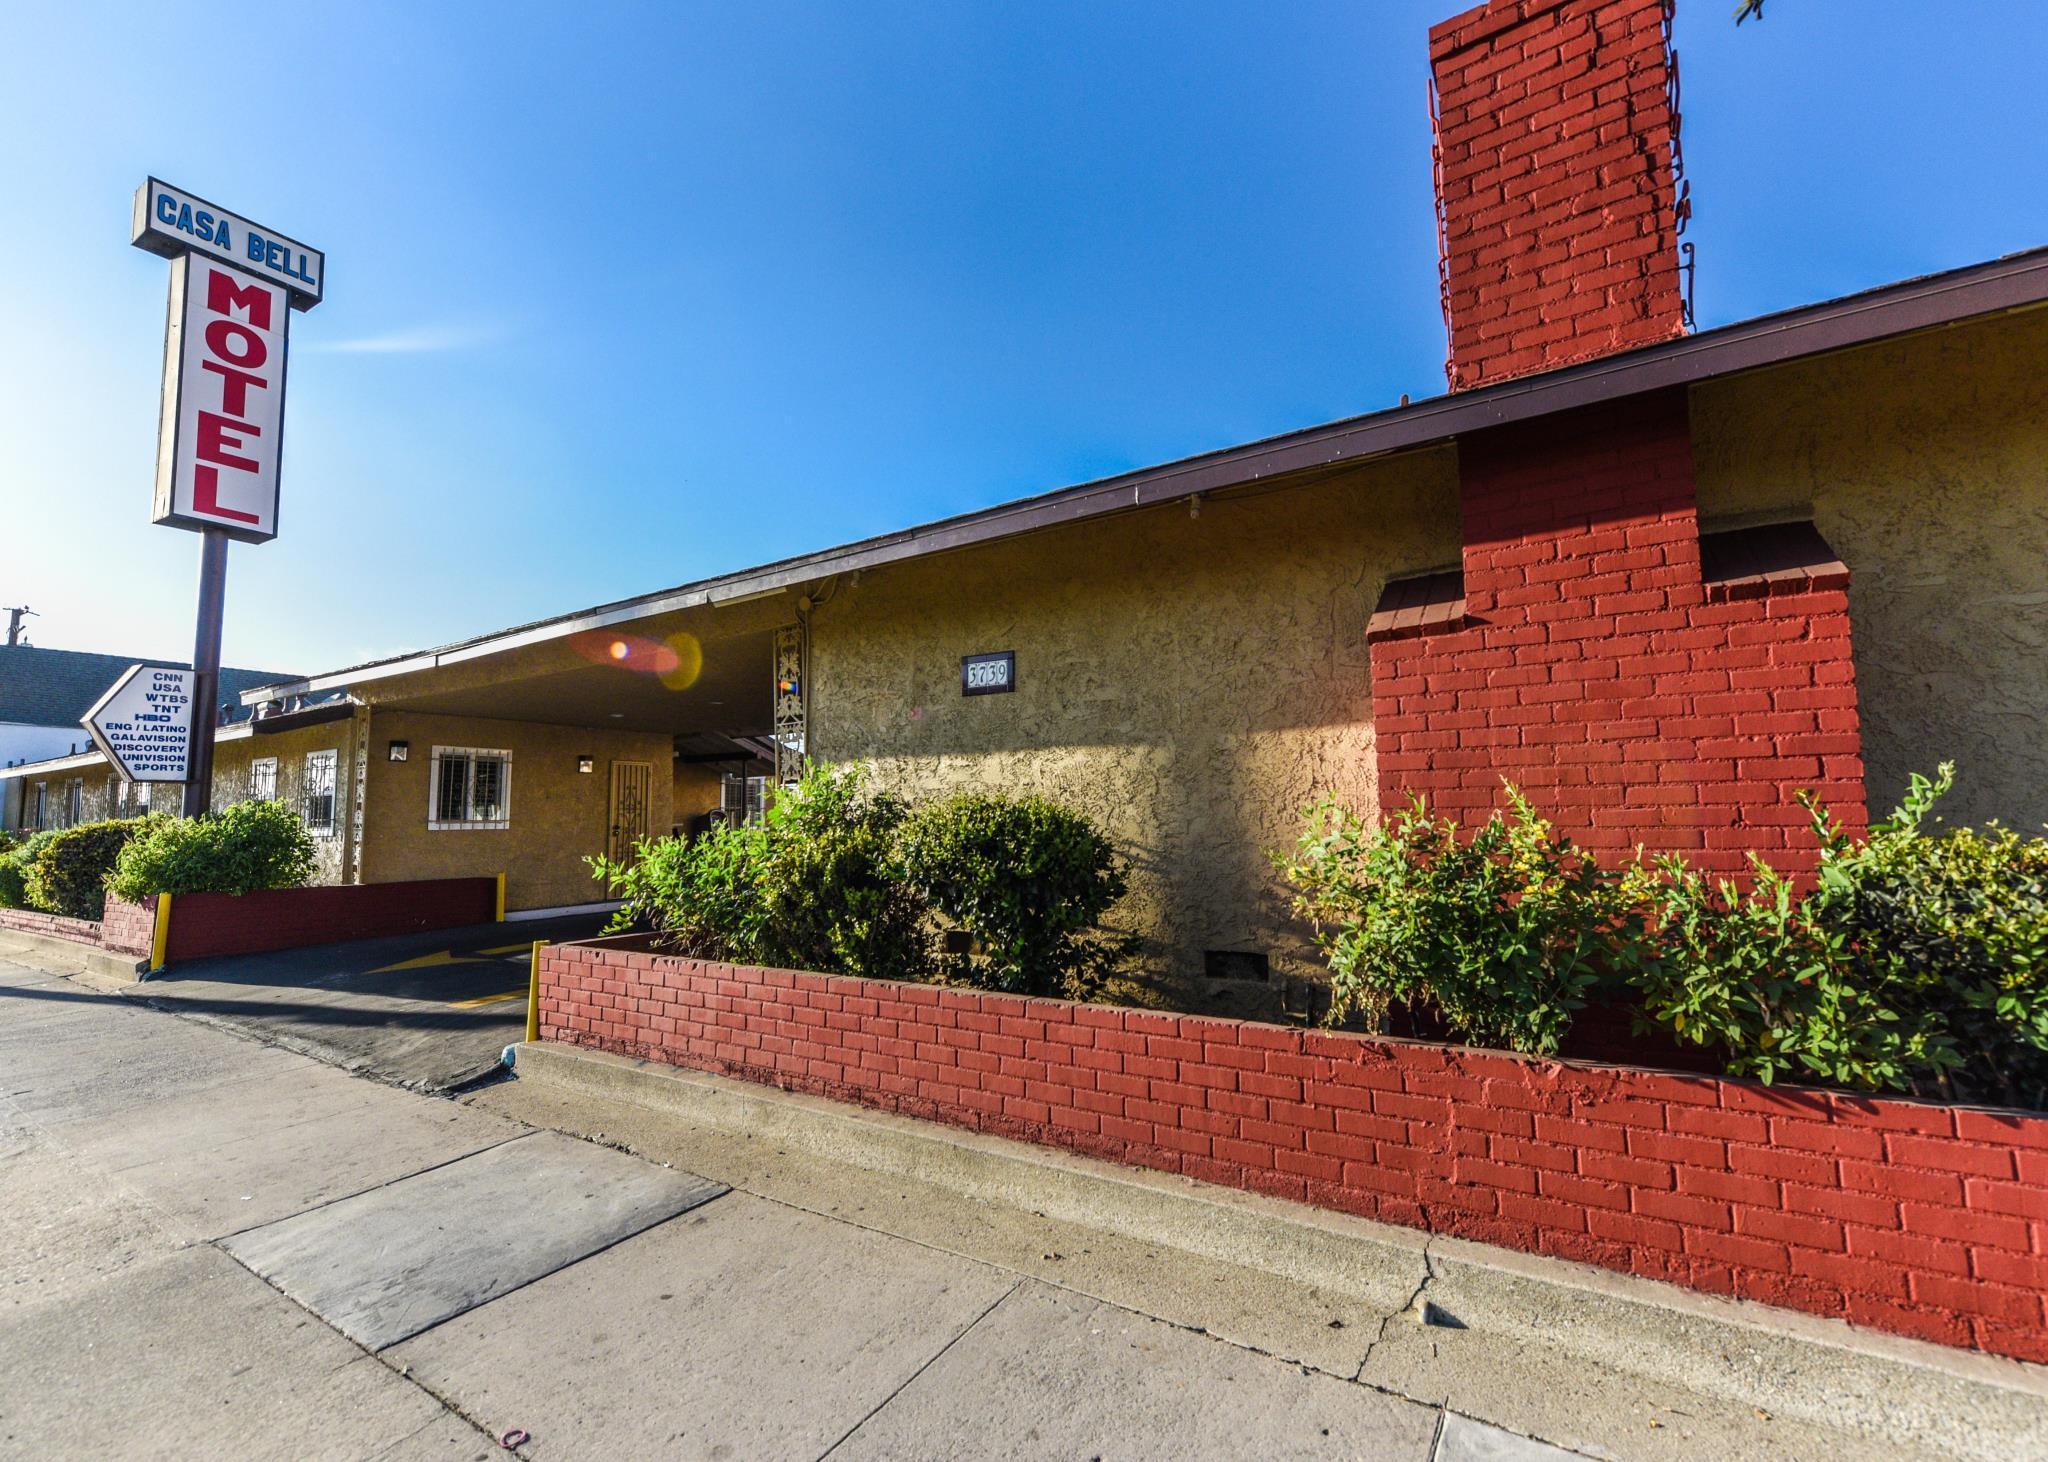 Casa Bell Motel Los Angeles LAX Airport